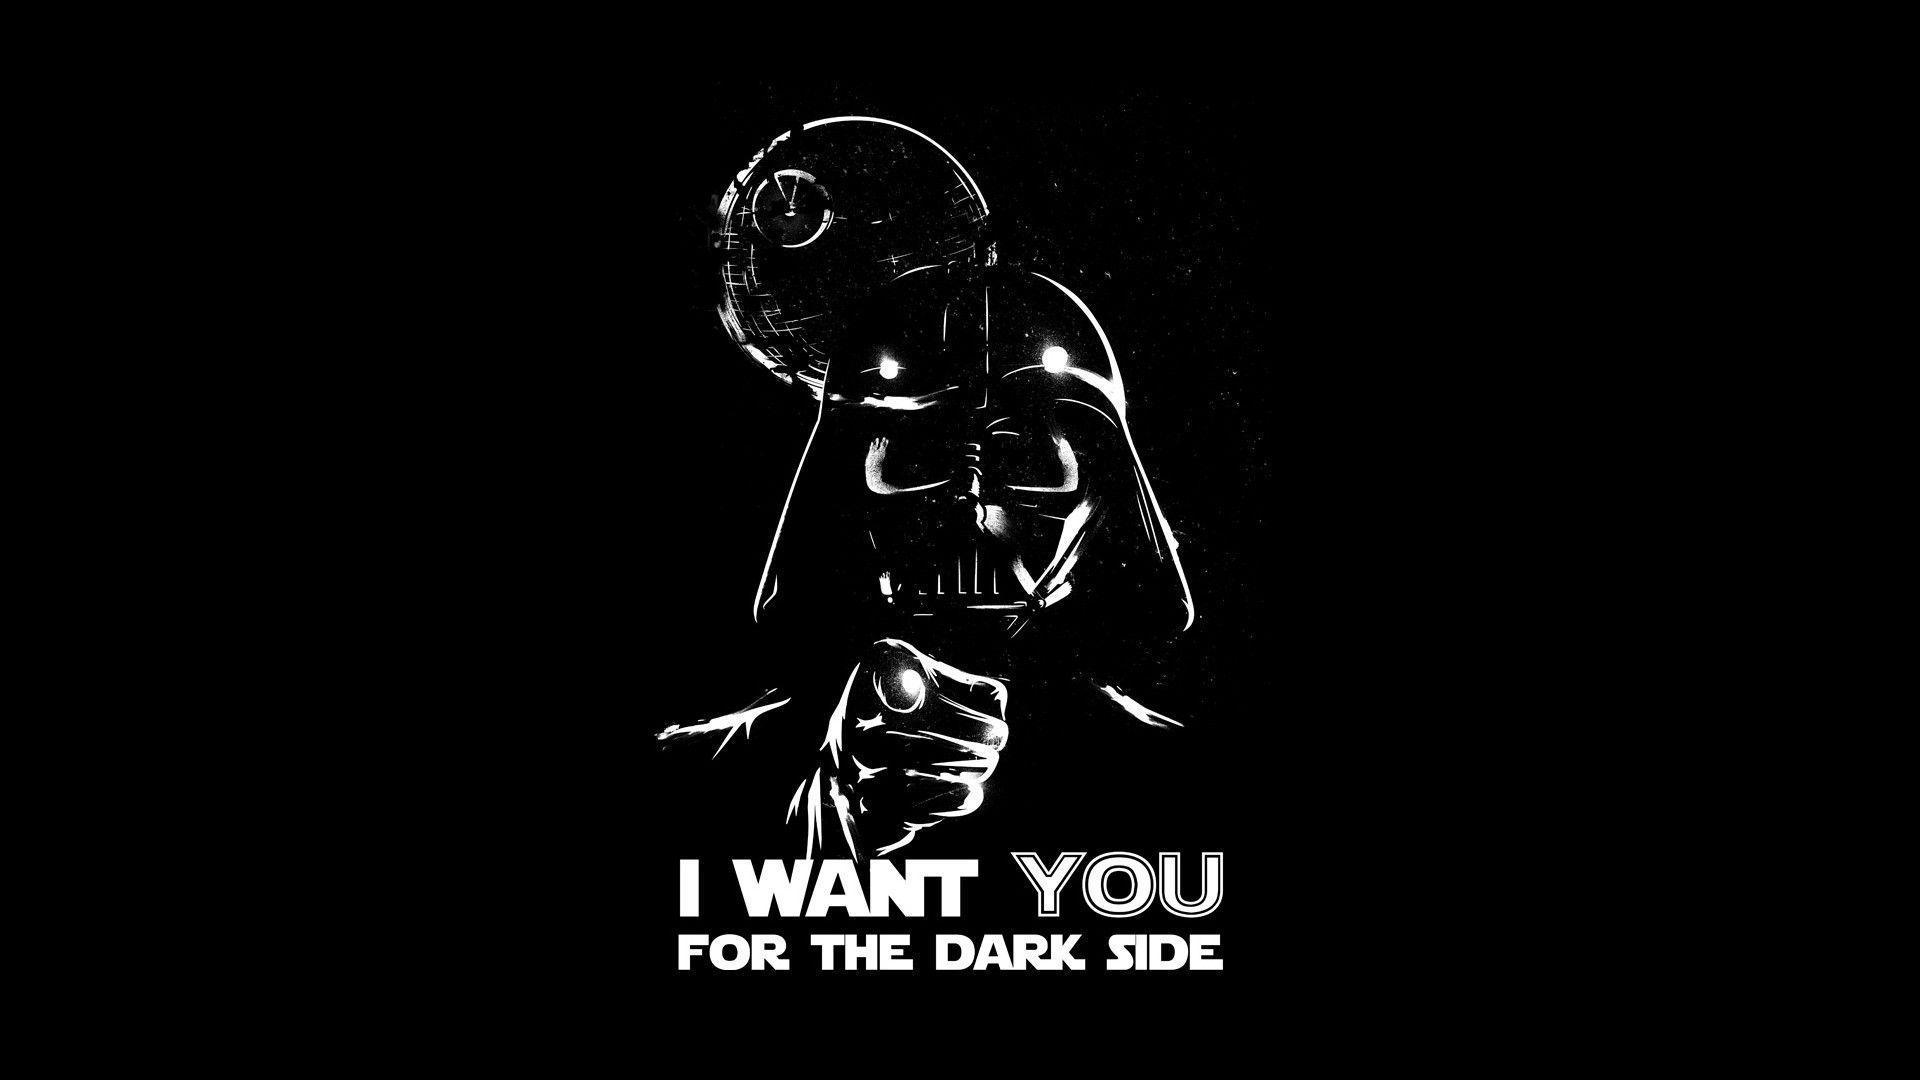 Hd wallpaper you need - Darth Vader Star Wars Game Hd Wallpaper Free Hd Desktop